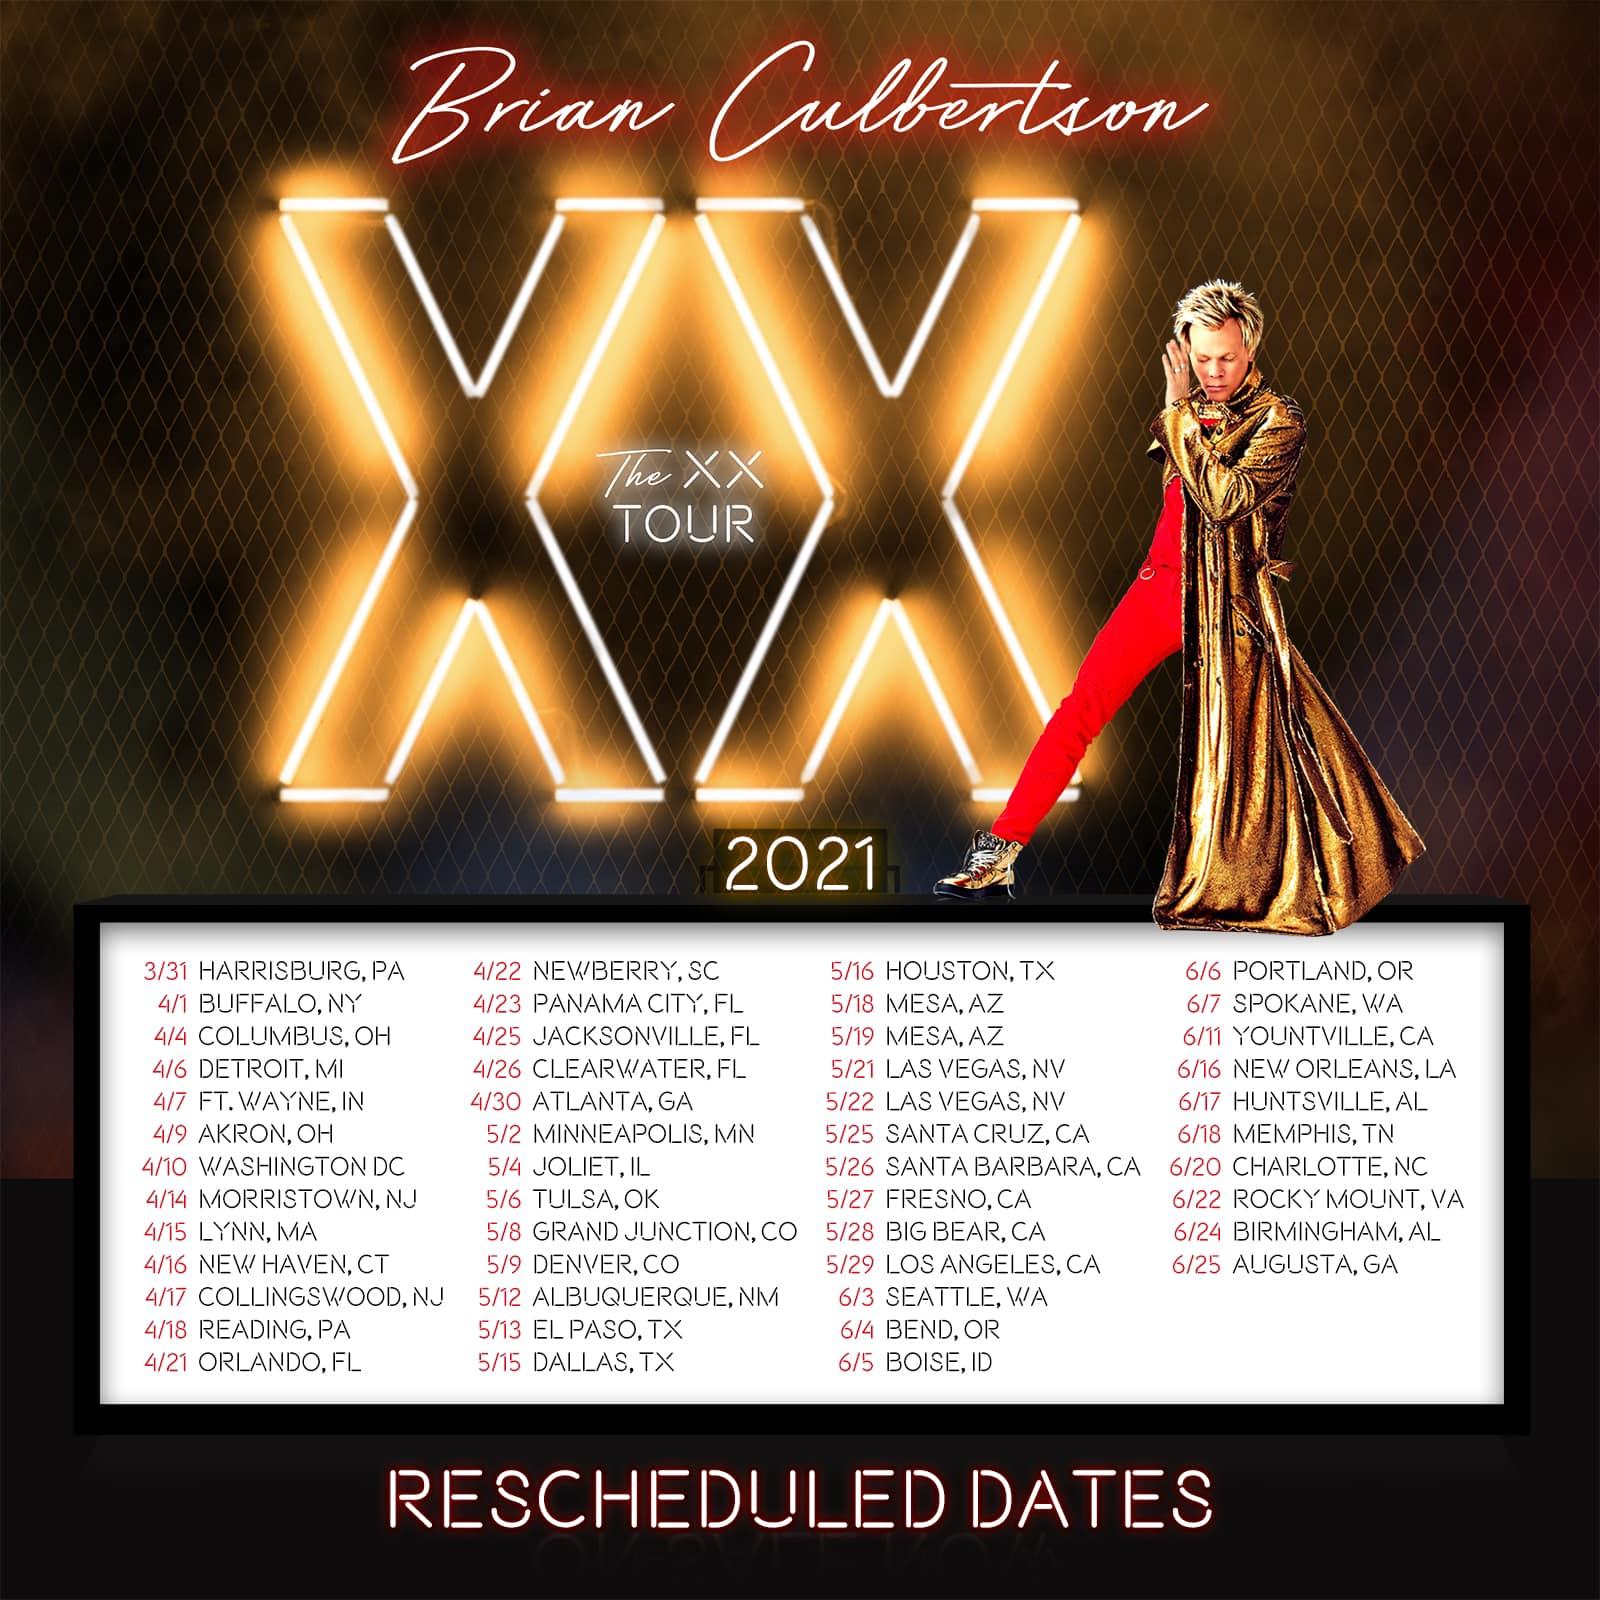 Brian Culbertson XX Tour Dates 2021